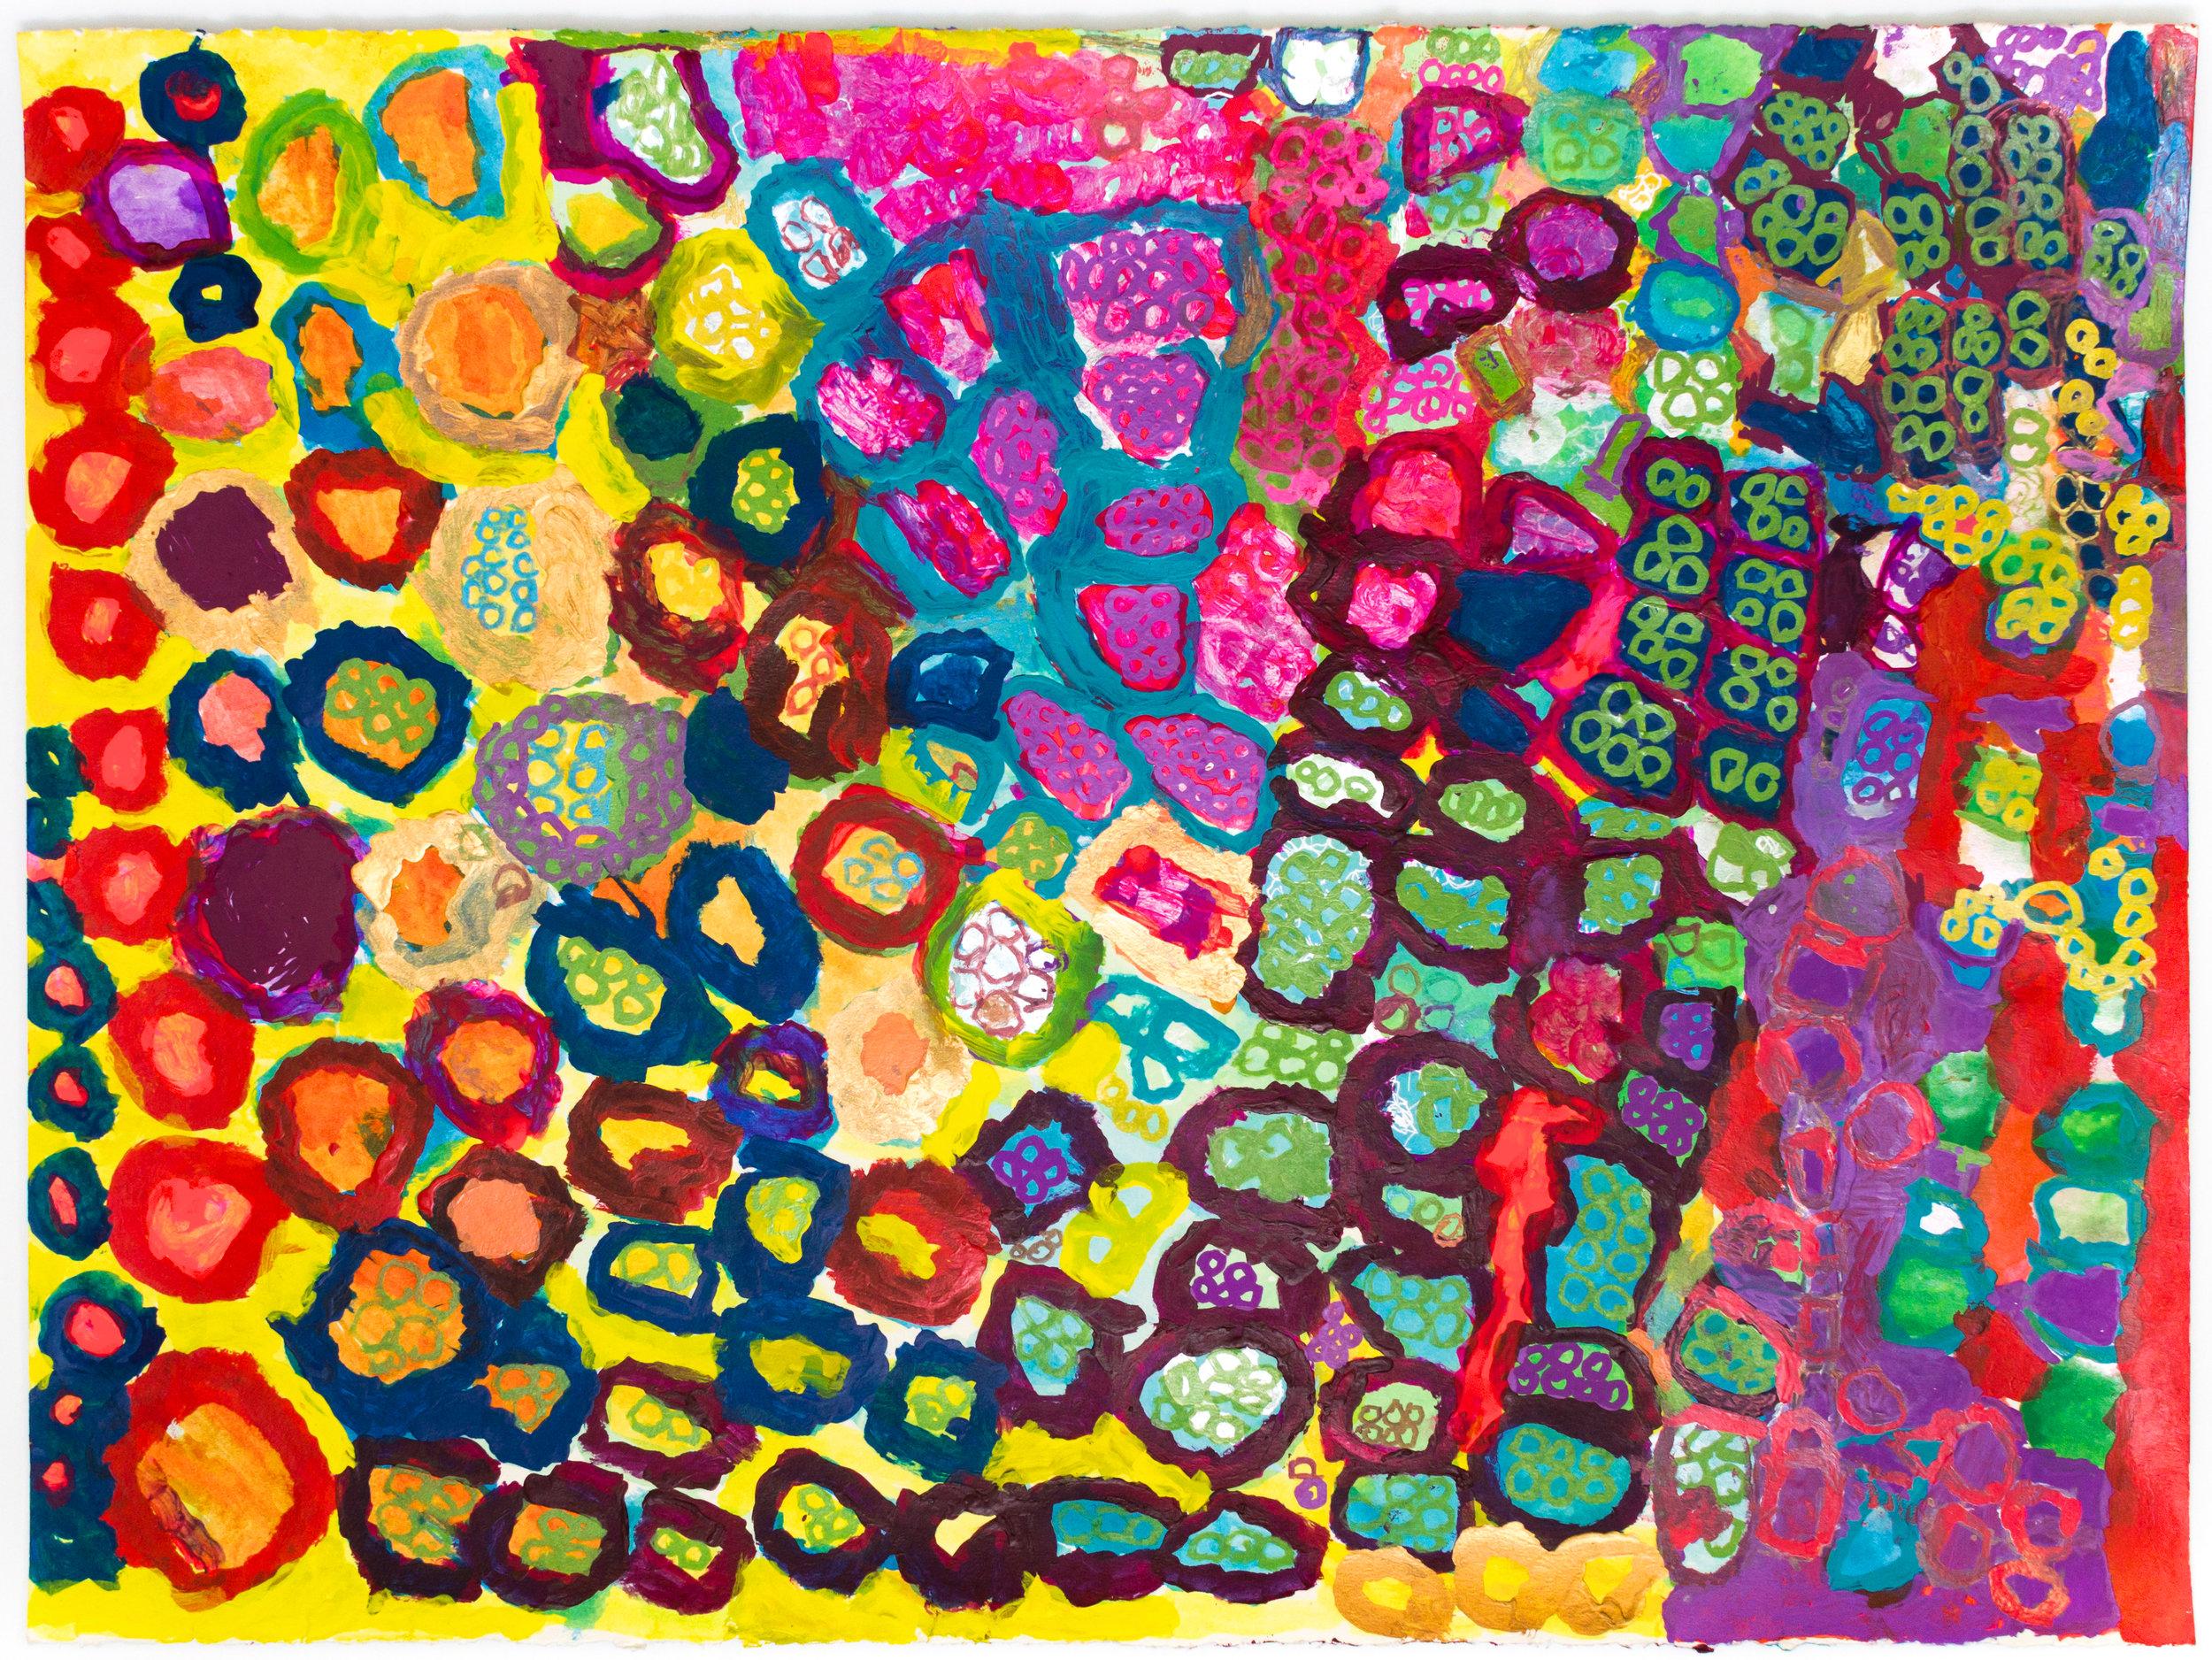 Barry Regan, Untitled (BR 083), 2017, 22 x 30 inches